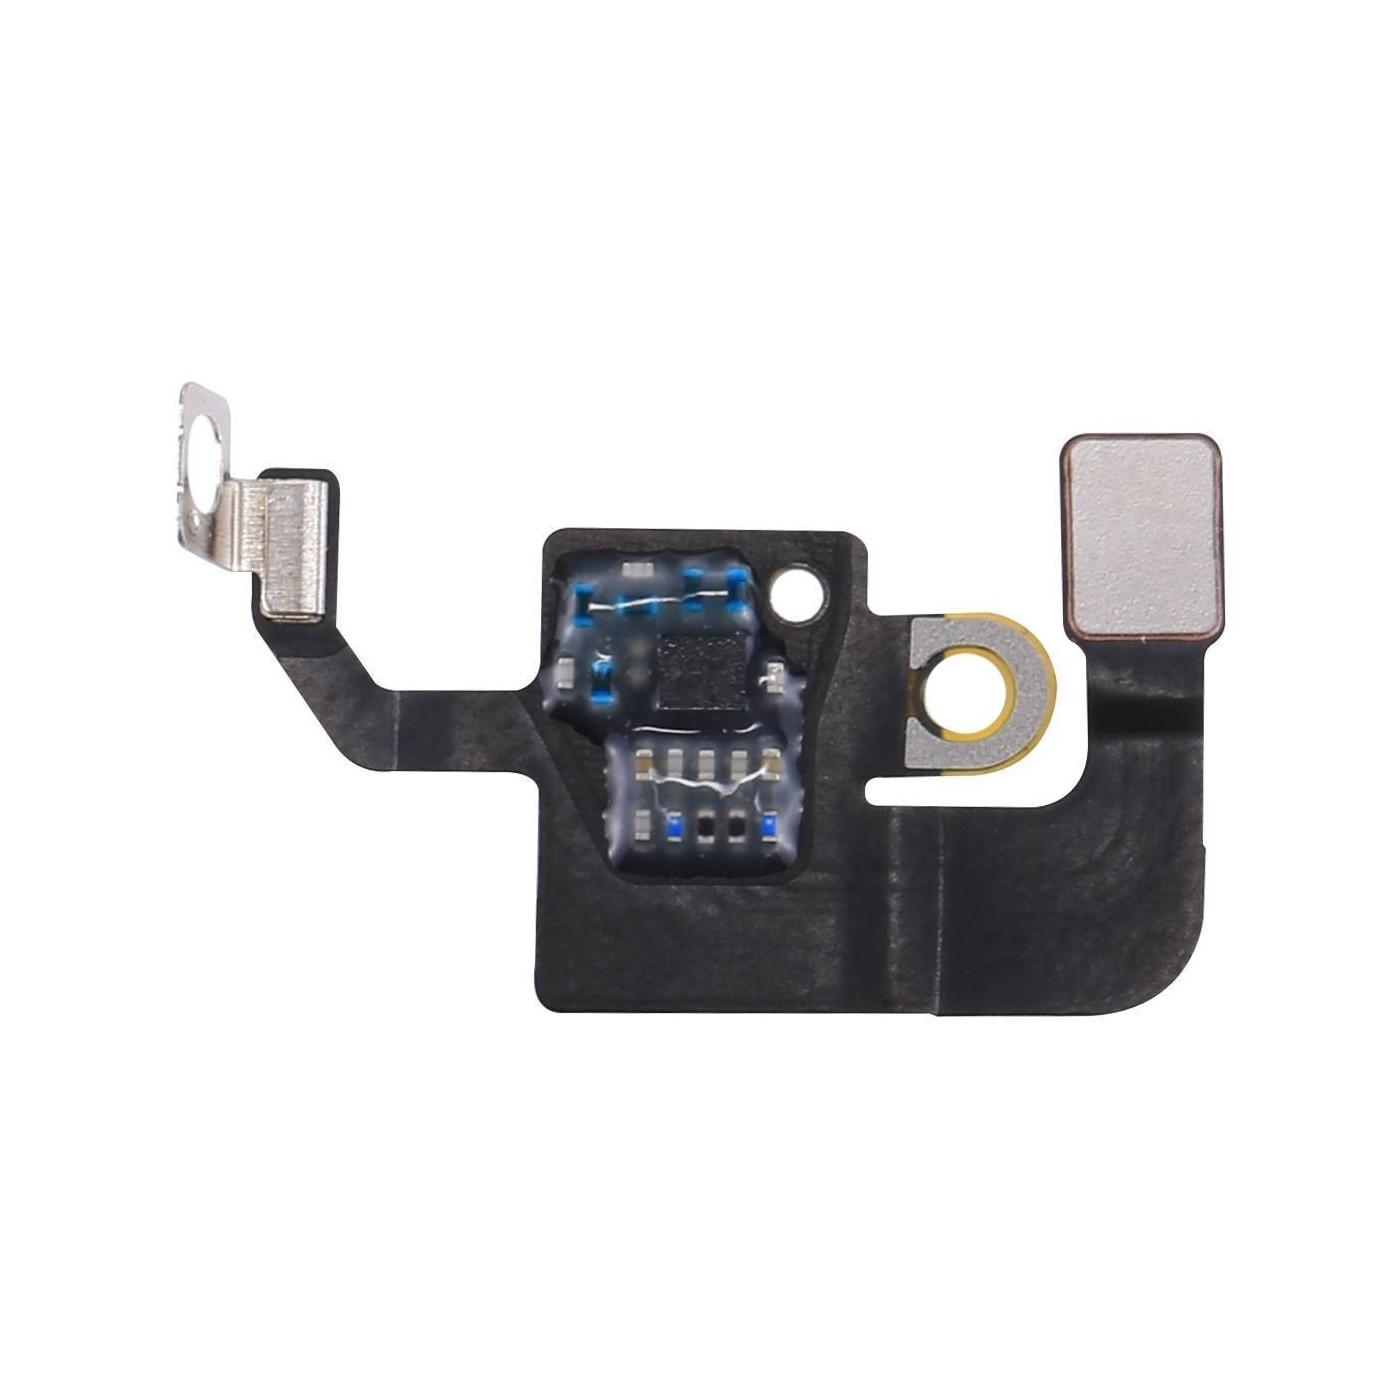 ANTENNA SIGNAL WiFi GPS 8 IPHONE PLUS RECEIVING WIRELESS